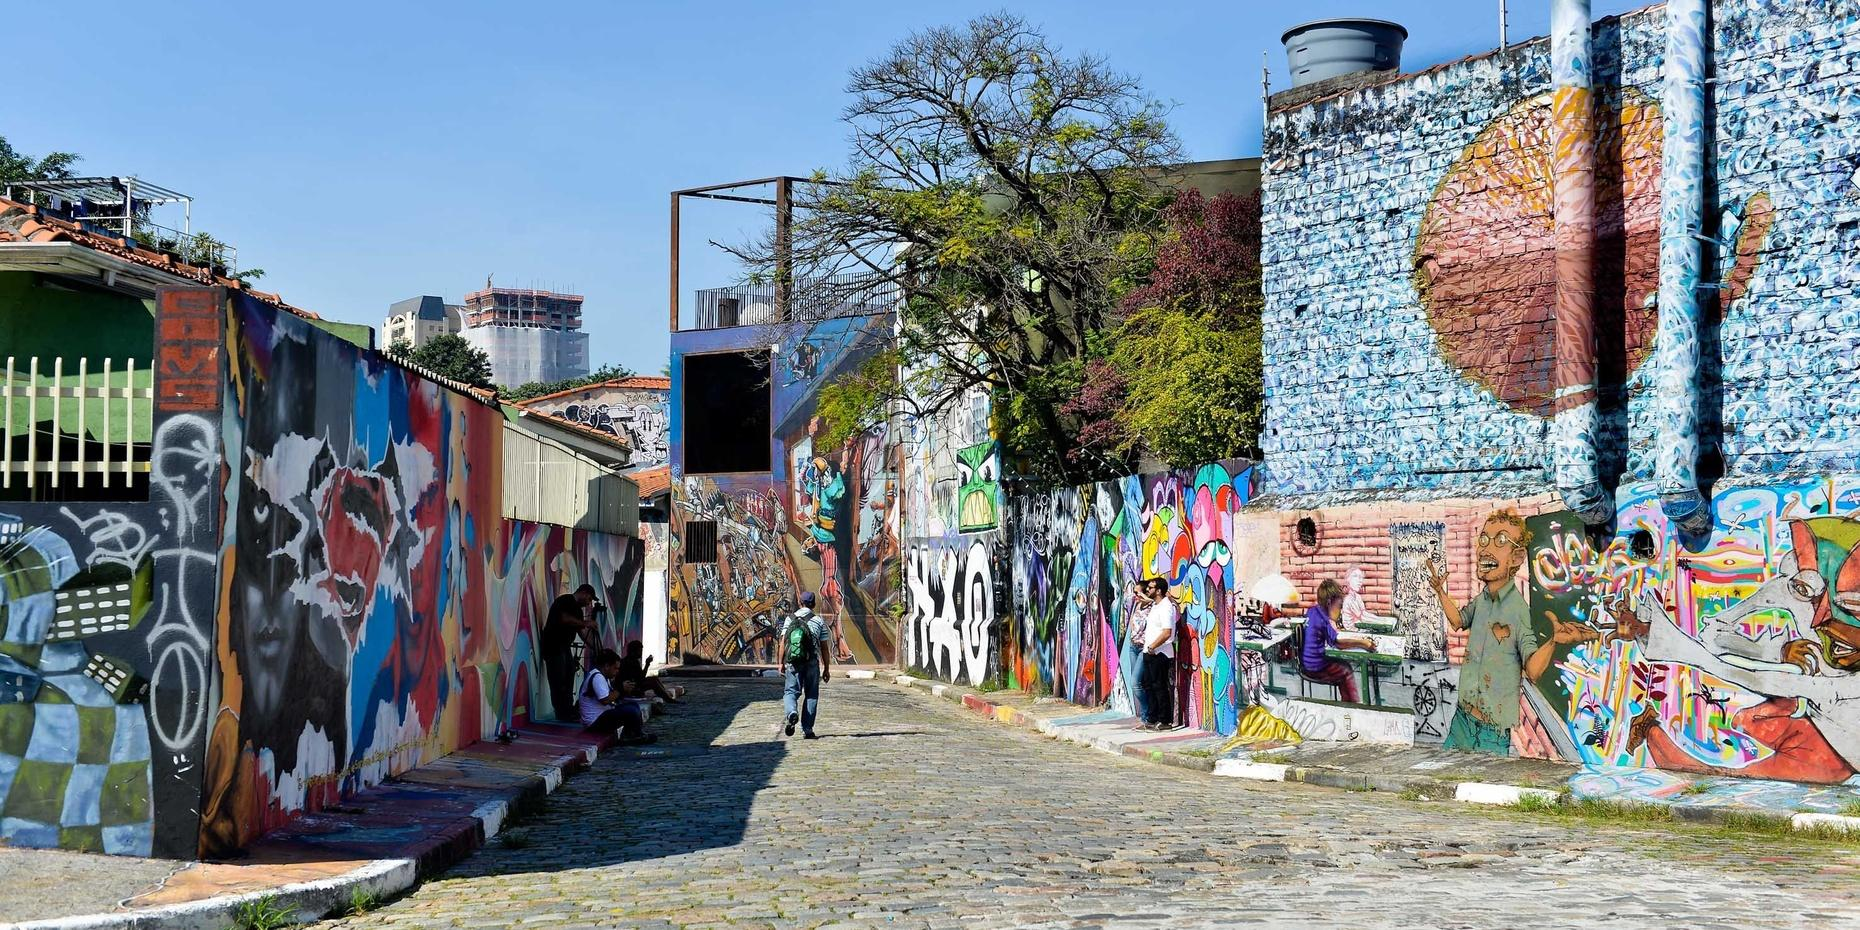 Private São Paulo Premium Tour | 5 hours